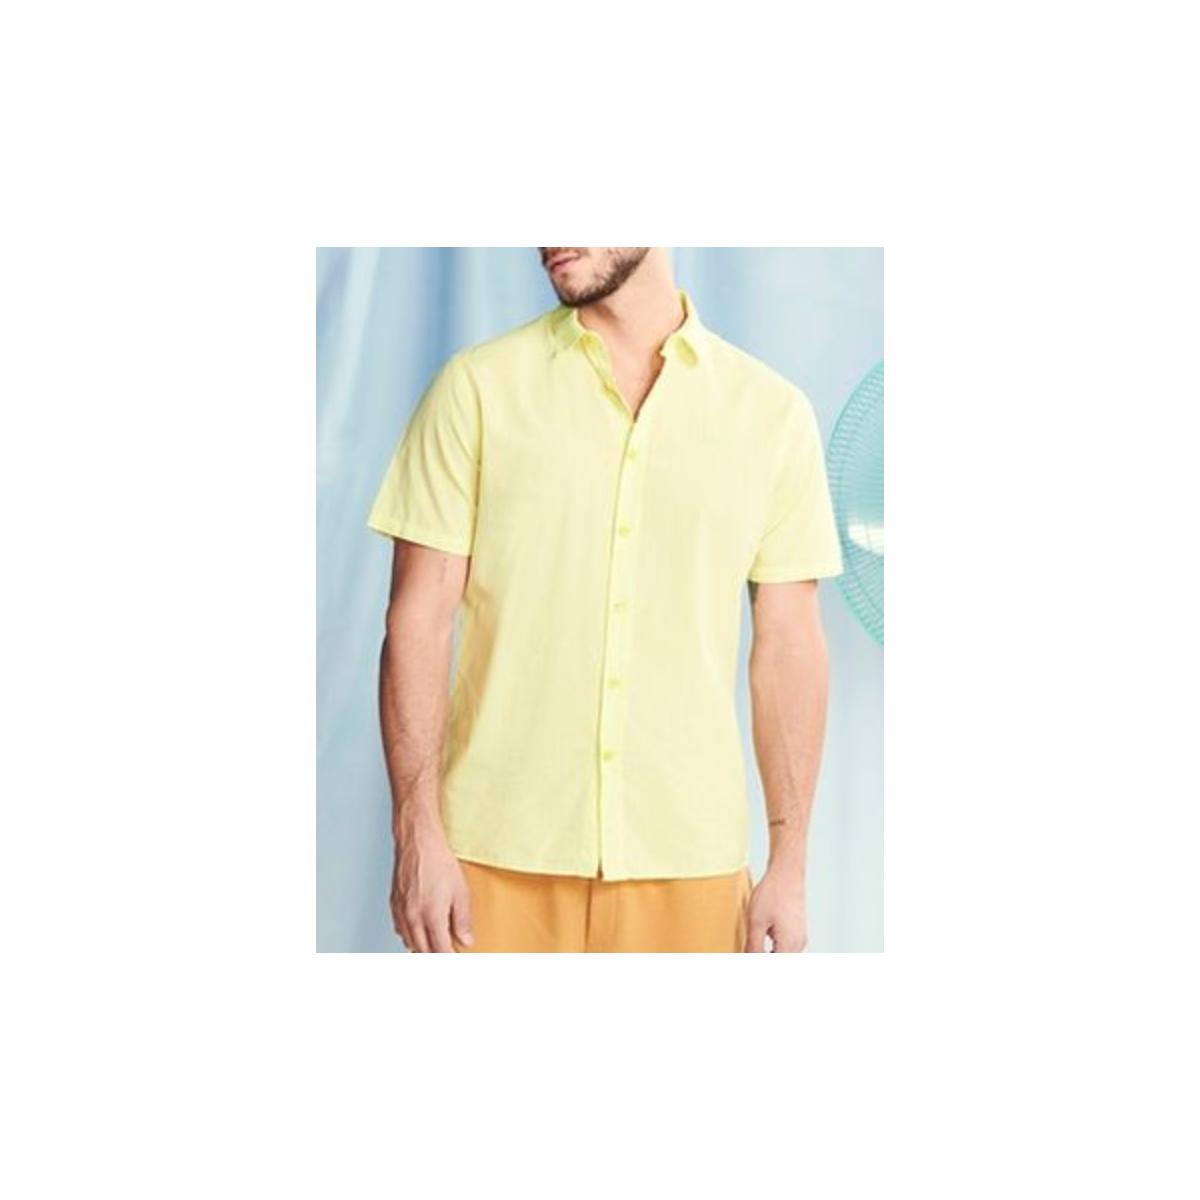 Camisa Masculina Colcci 310103670 53692 Amarelo